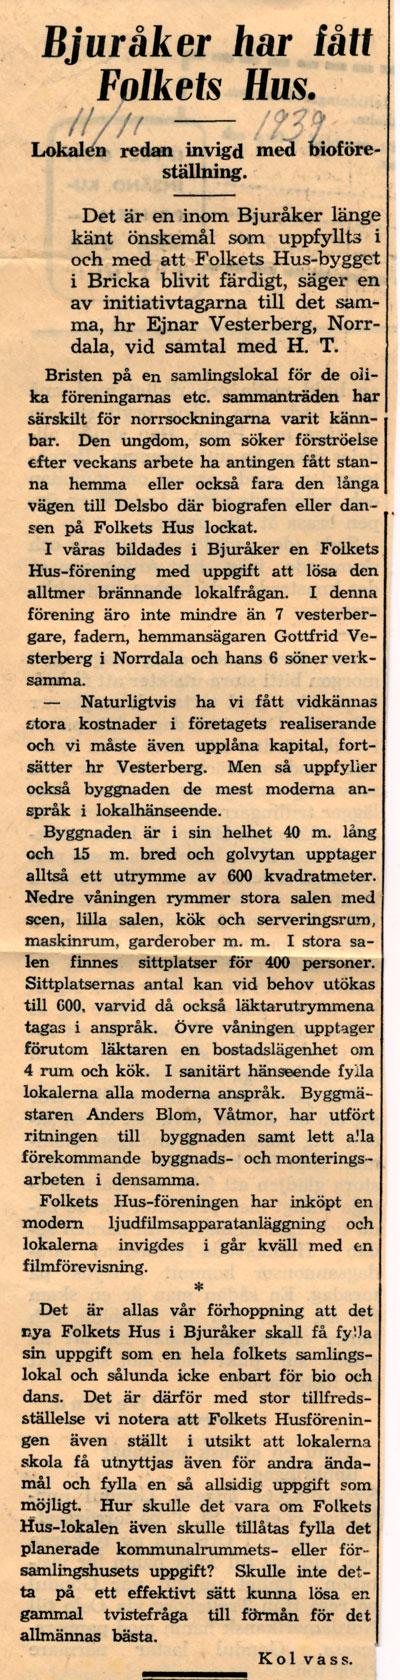 Helena Bringner, 45 r i Bjurker p Grdsmyra 2 - omr-scanner.net